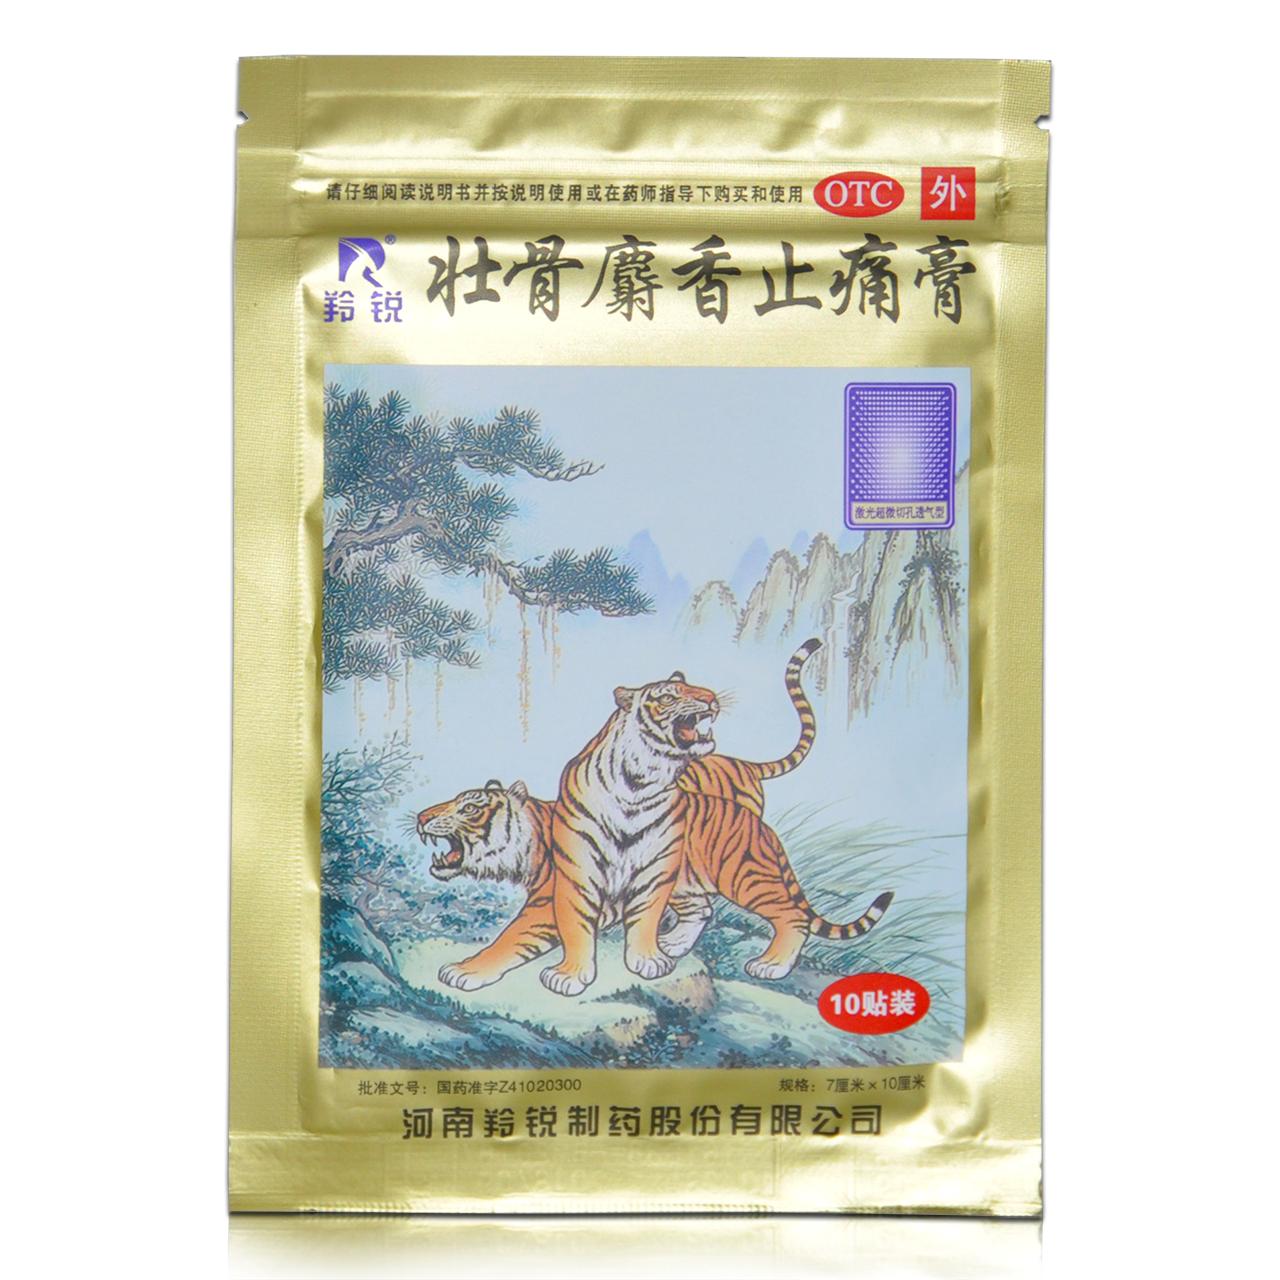 Пластырь обезболивающий на основе мускуса «Тигр» (Zhuanggu Shexiang Zhitong Gao) 10шт.